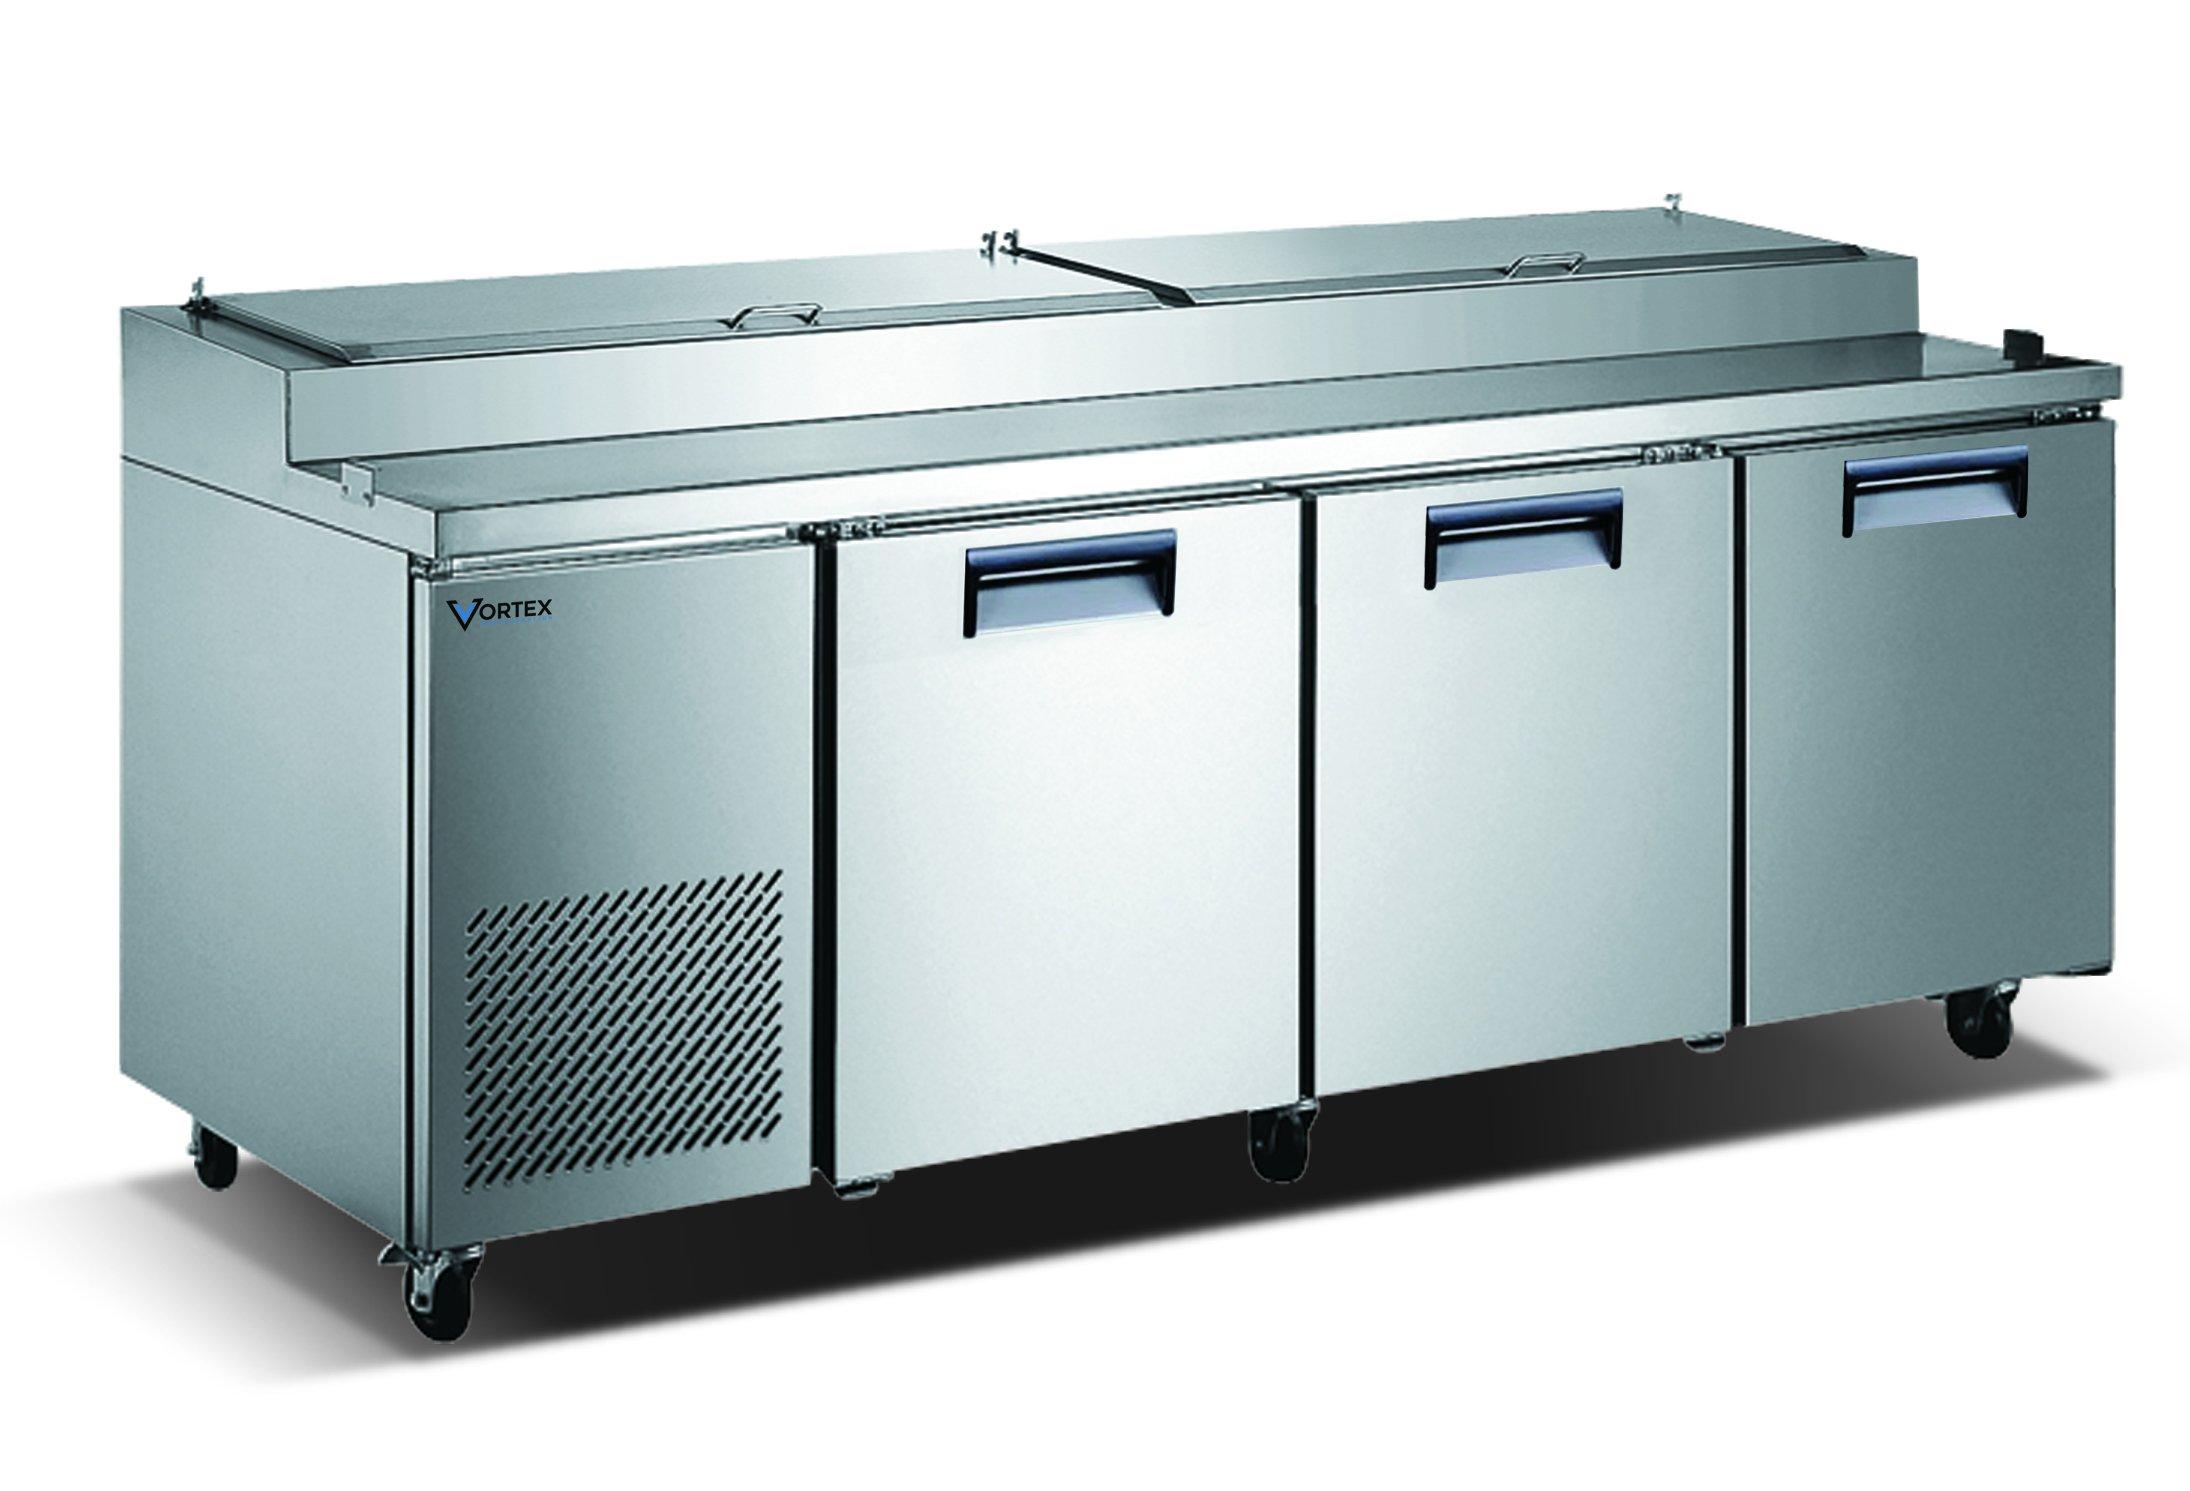 Vortex Refrigeration Commercial 3 Door, 93'' Pizza Prep Table - 24.2 Cu. Ft.